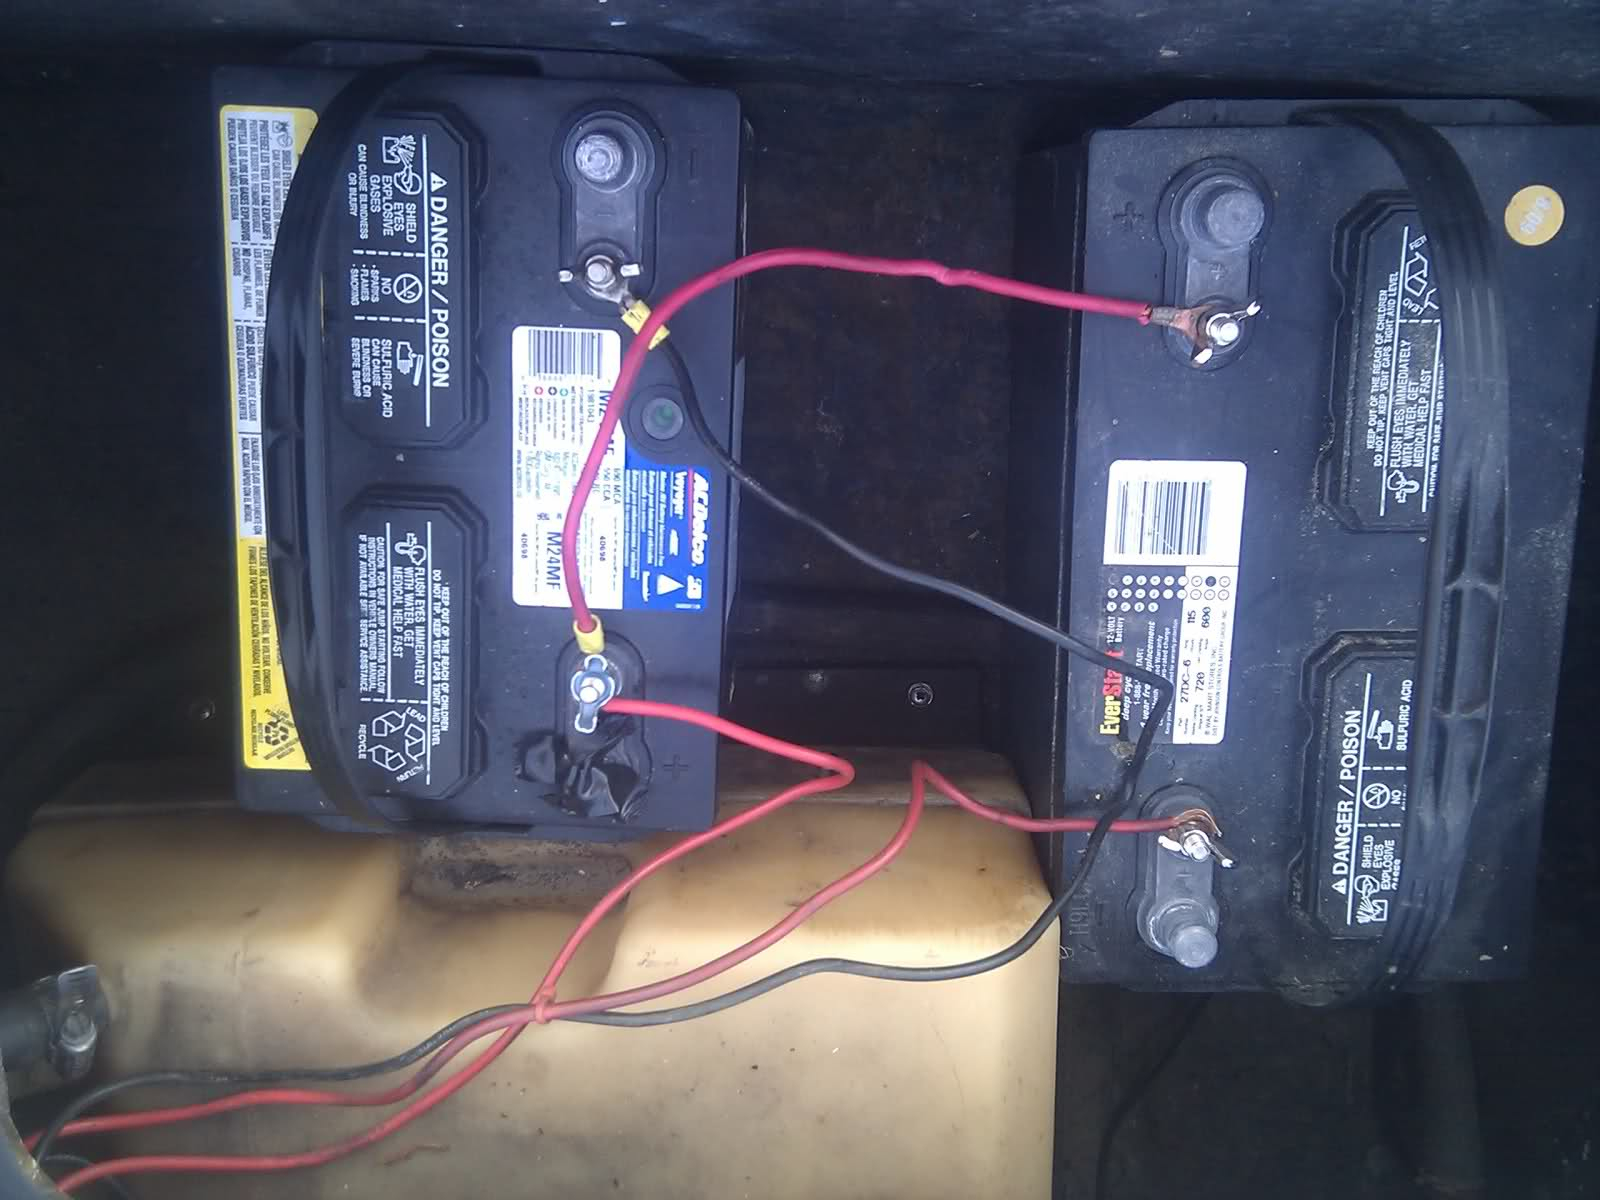 24 Volt Trolling Motor Battery Wiring | Manual E-Books - 12 24 Volt Trolling Motor Wiring Diagram